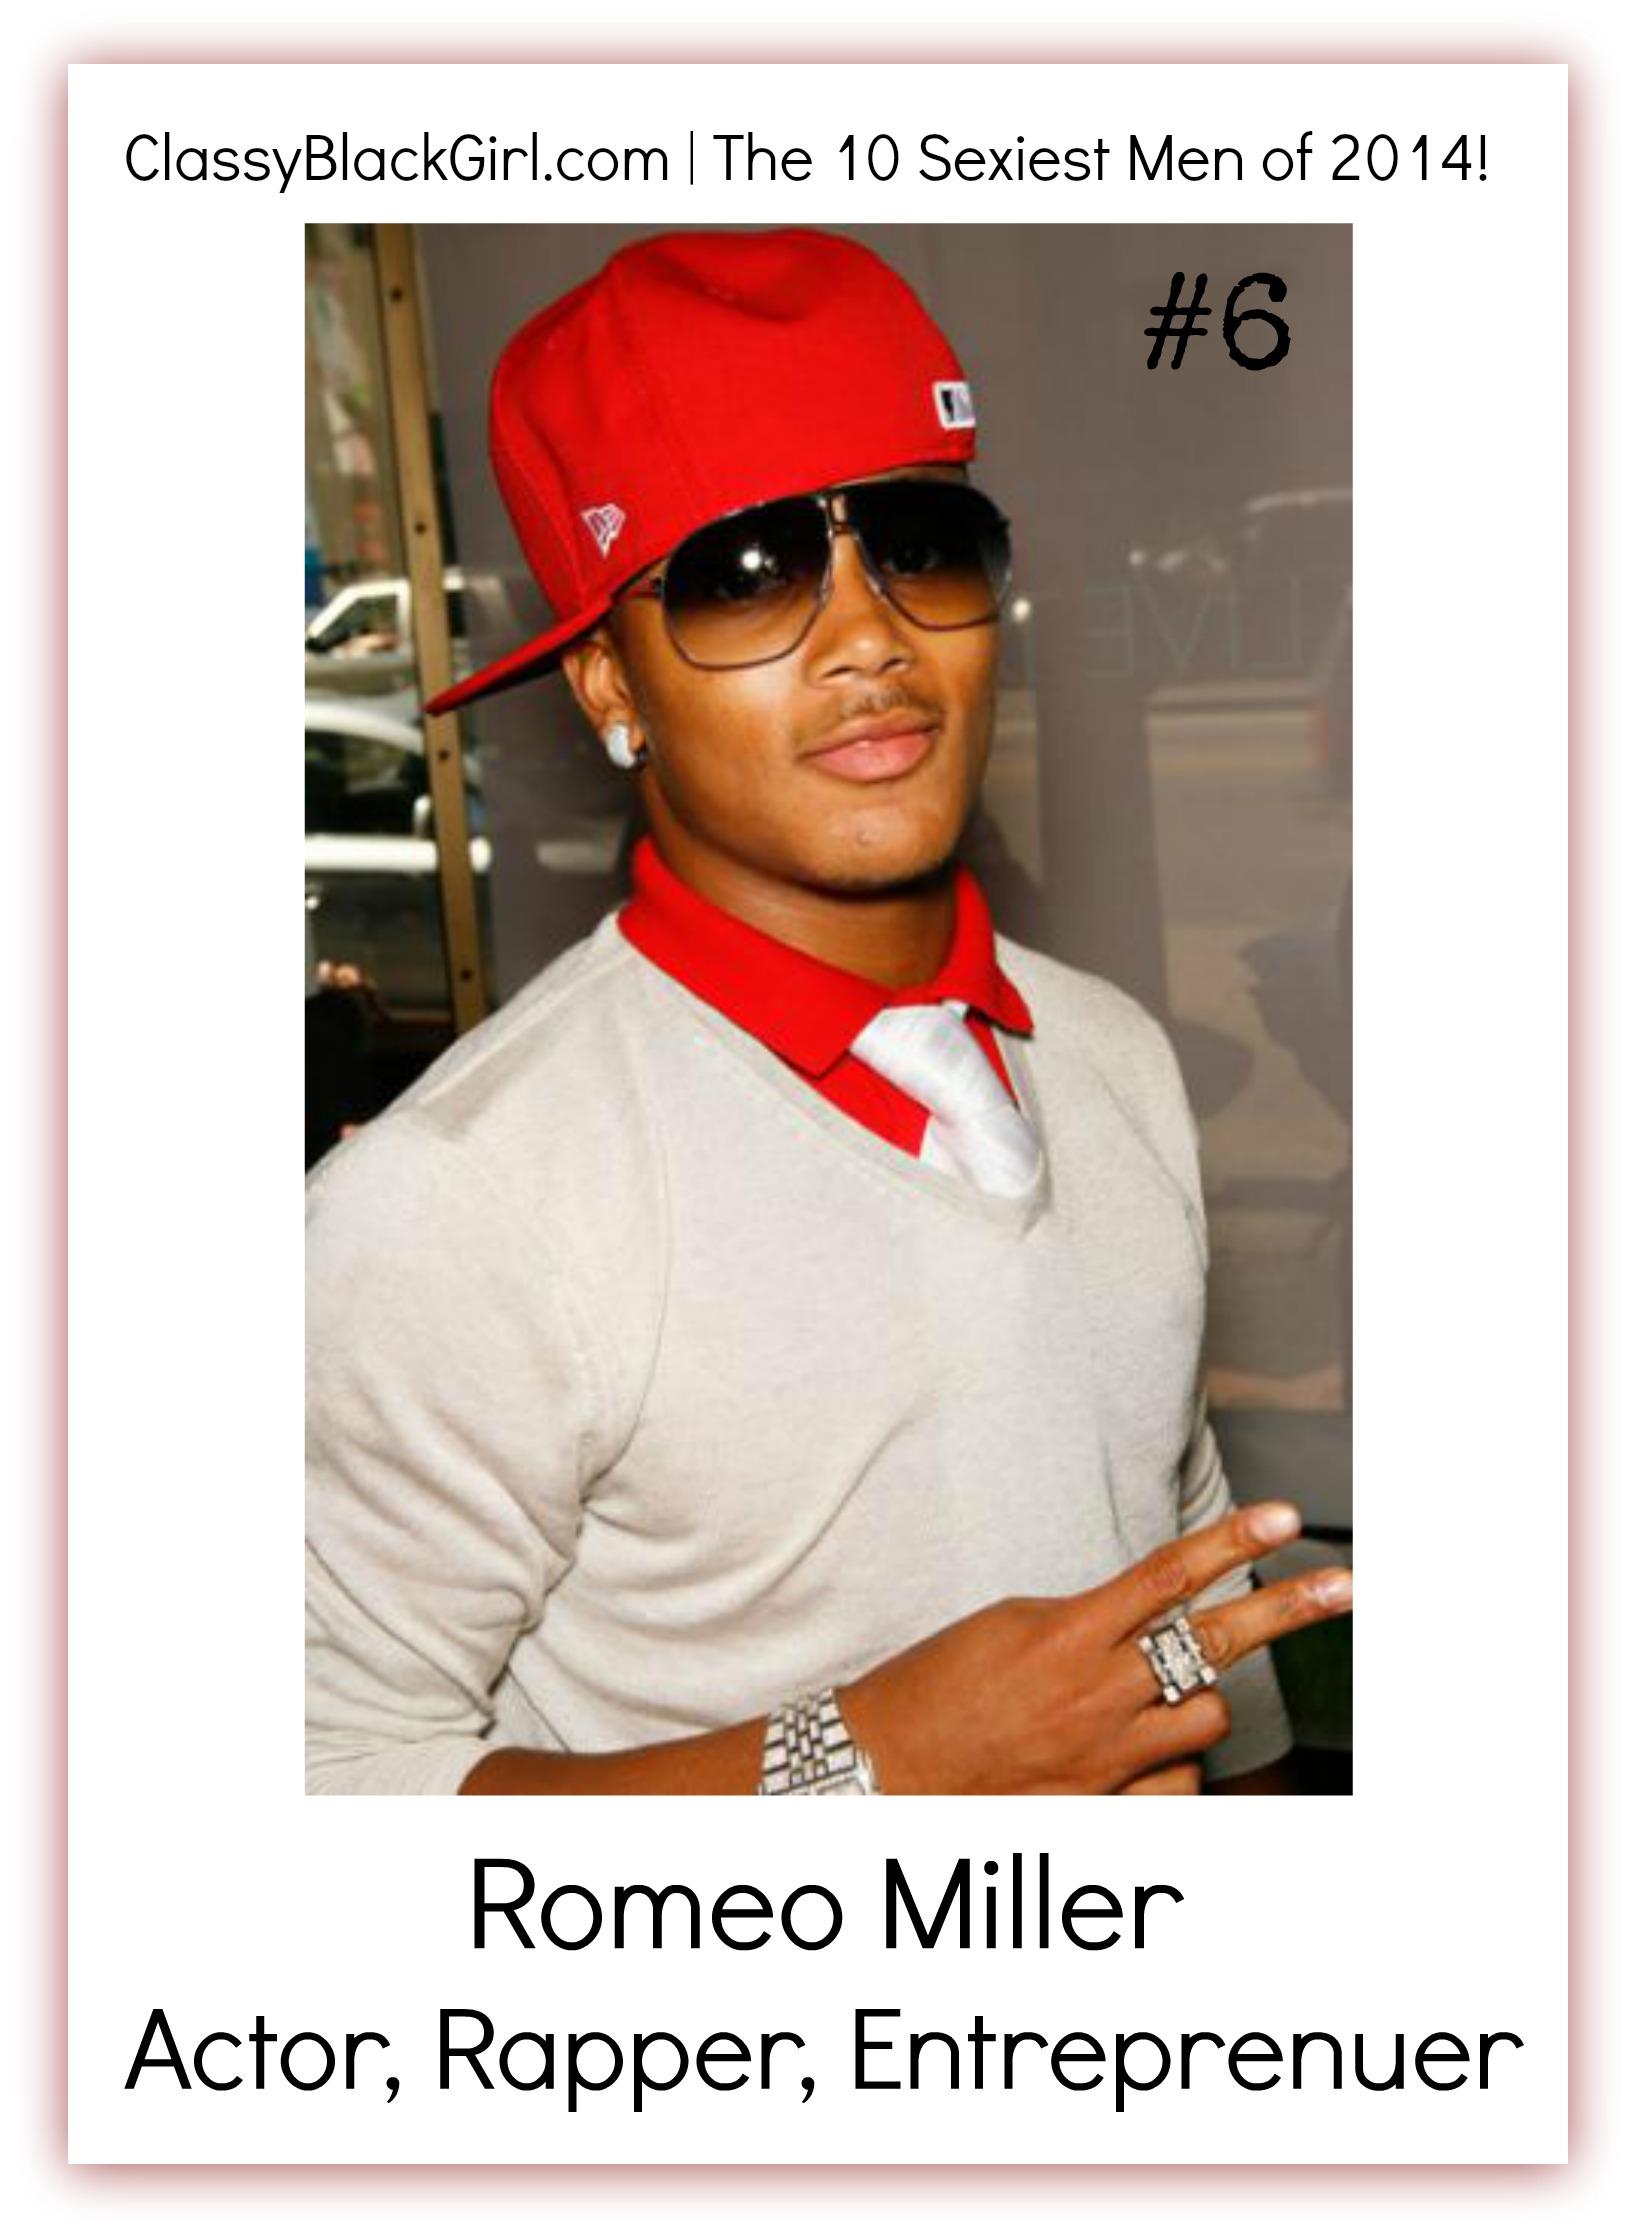 Romeo Miller Classy Black Girl 10 Sexiest Men of 2014